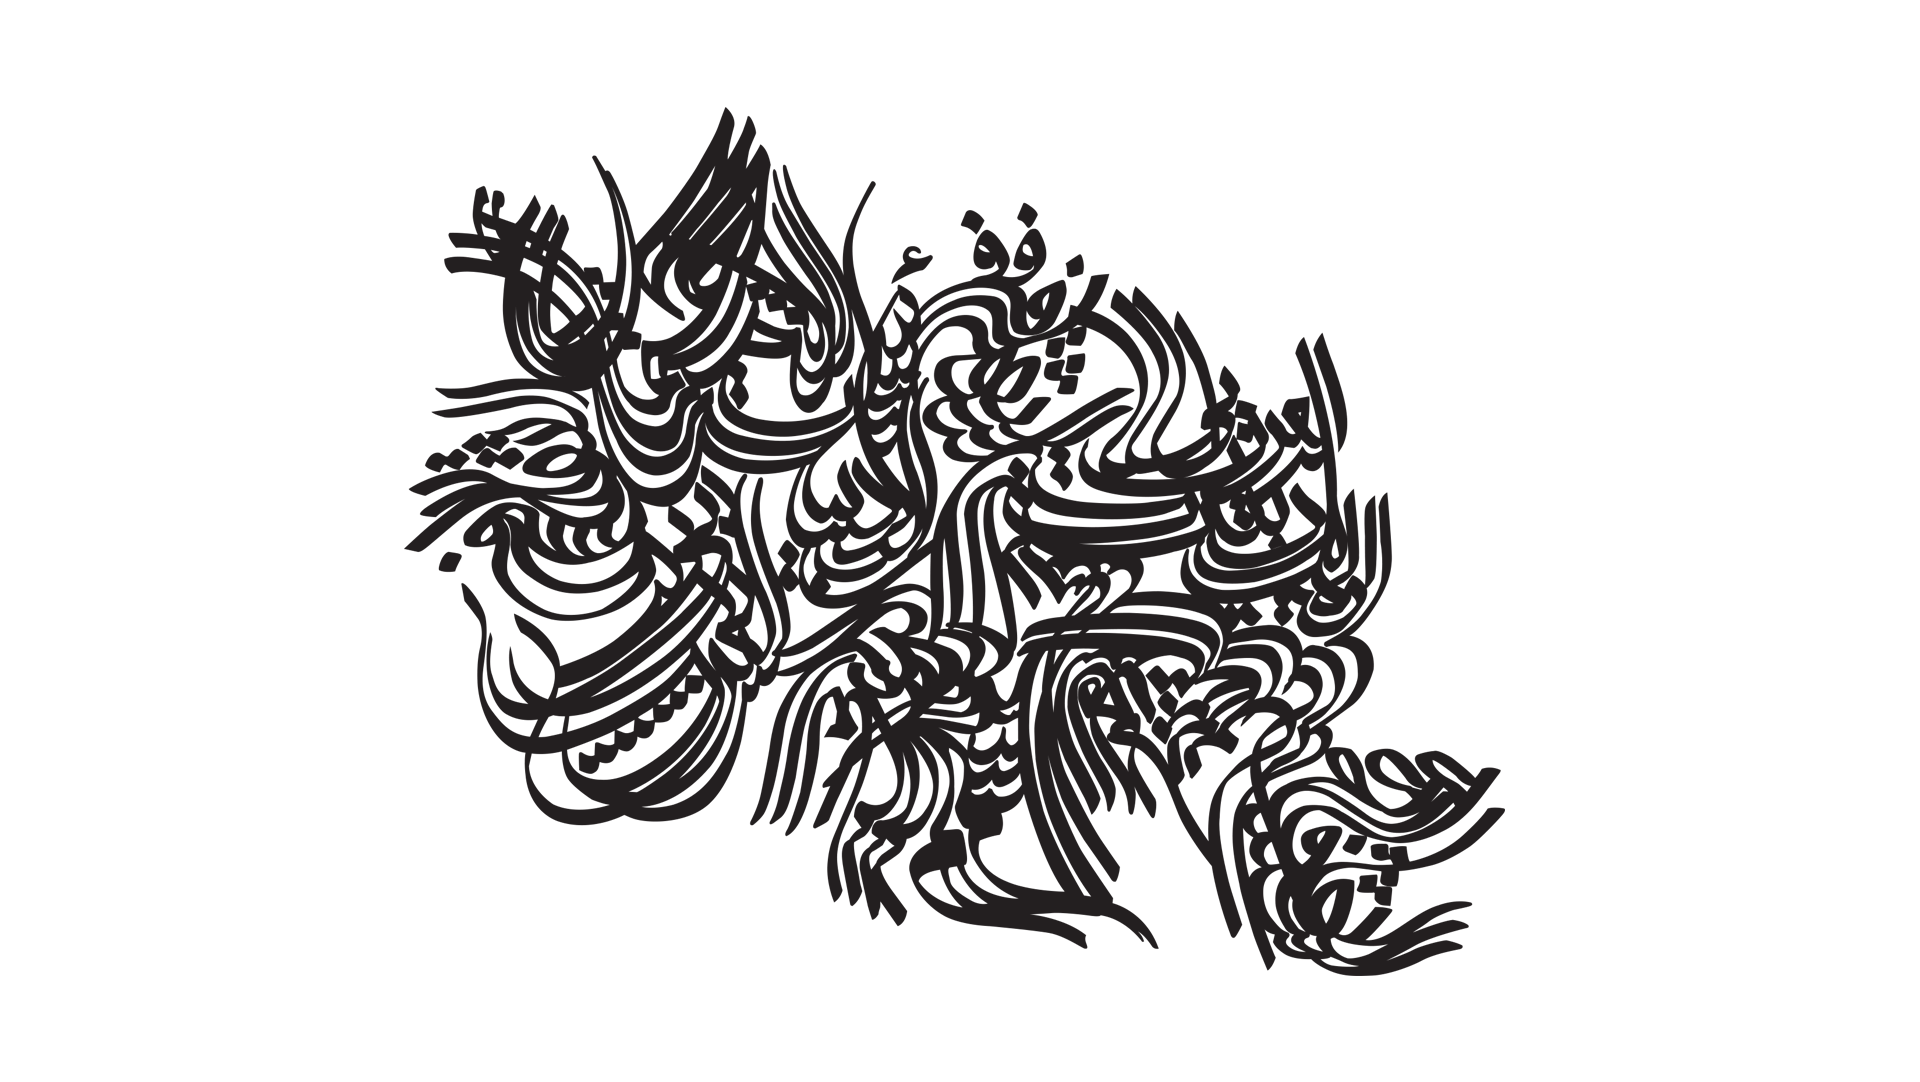 Studio Katrahmani استودیو کت رحمانی Calligraphy Doha Cultural Museum 2011 خوشنویسی موزه فرهنگی دوحه